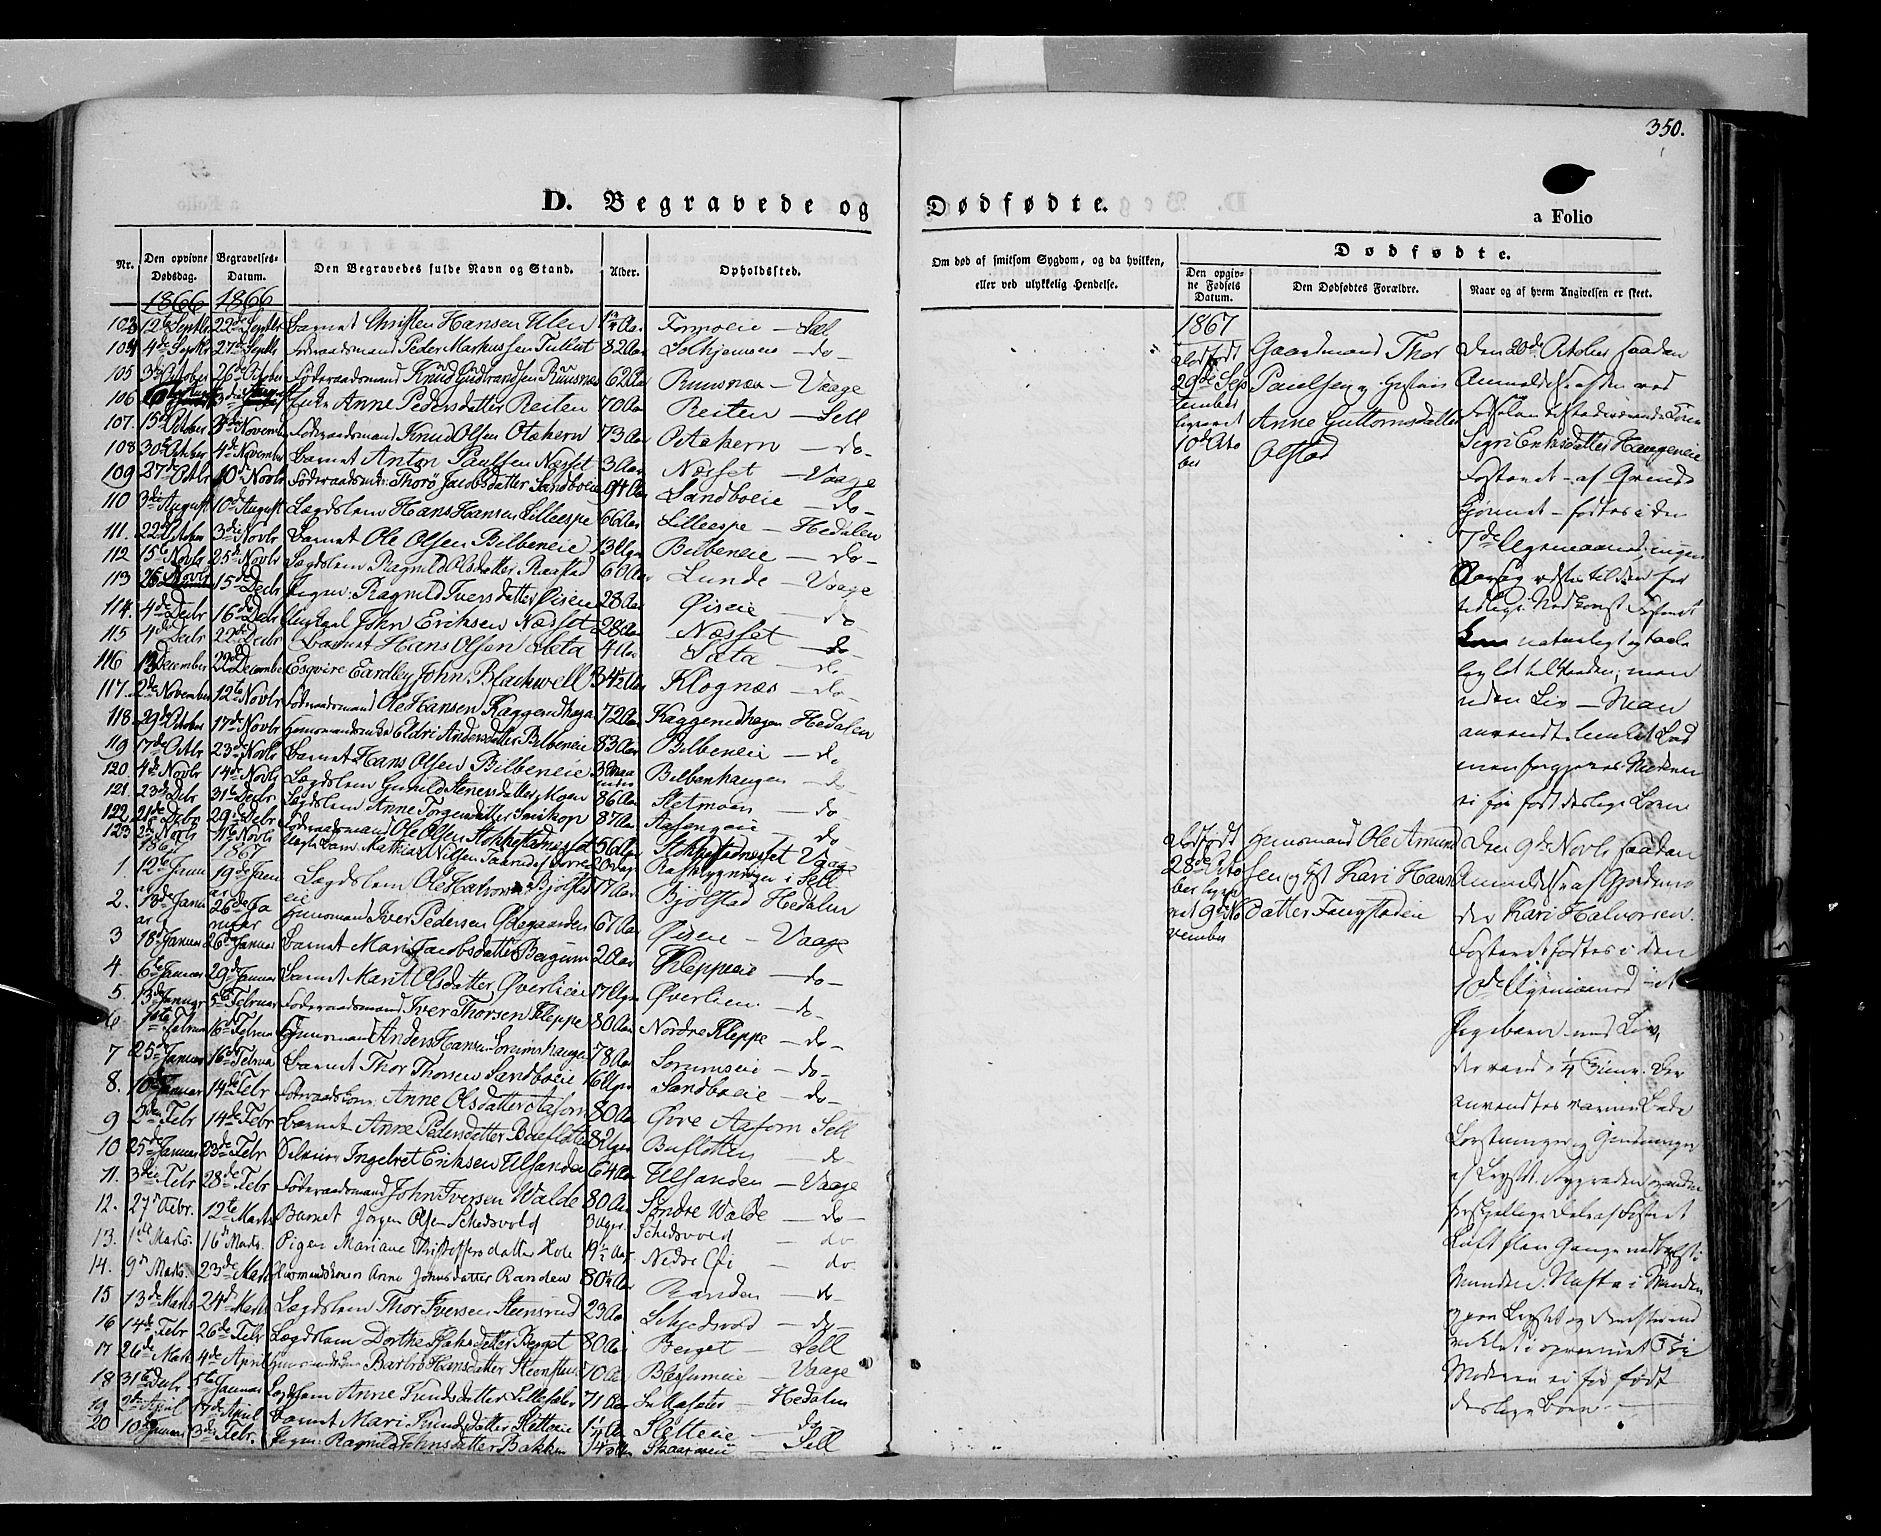 SAH, Vågå prestekontor, Ministerialbok nr. 6 /1, 1856-1872, s. 350